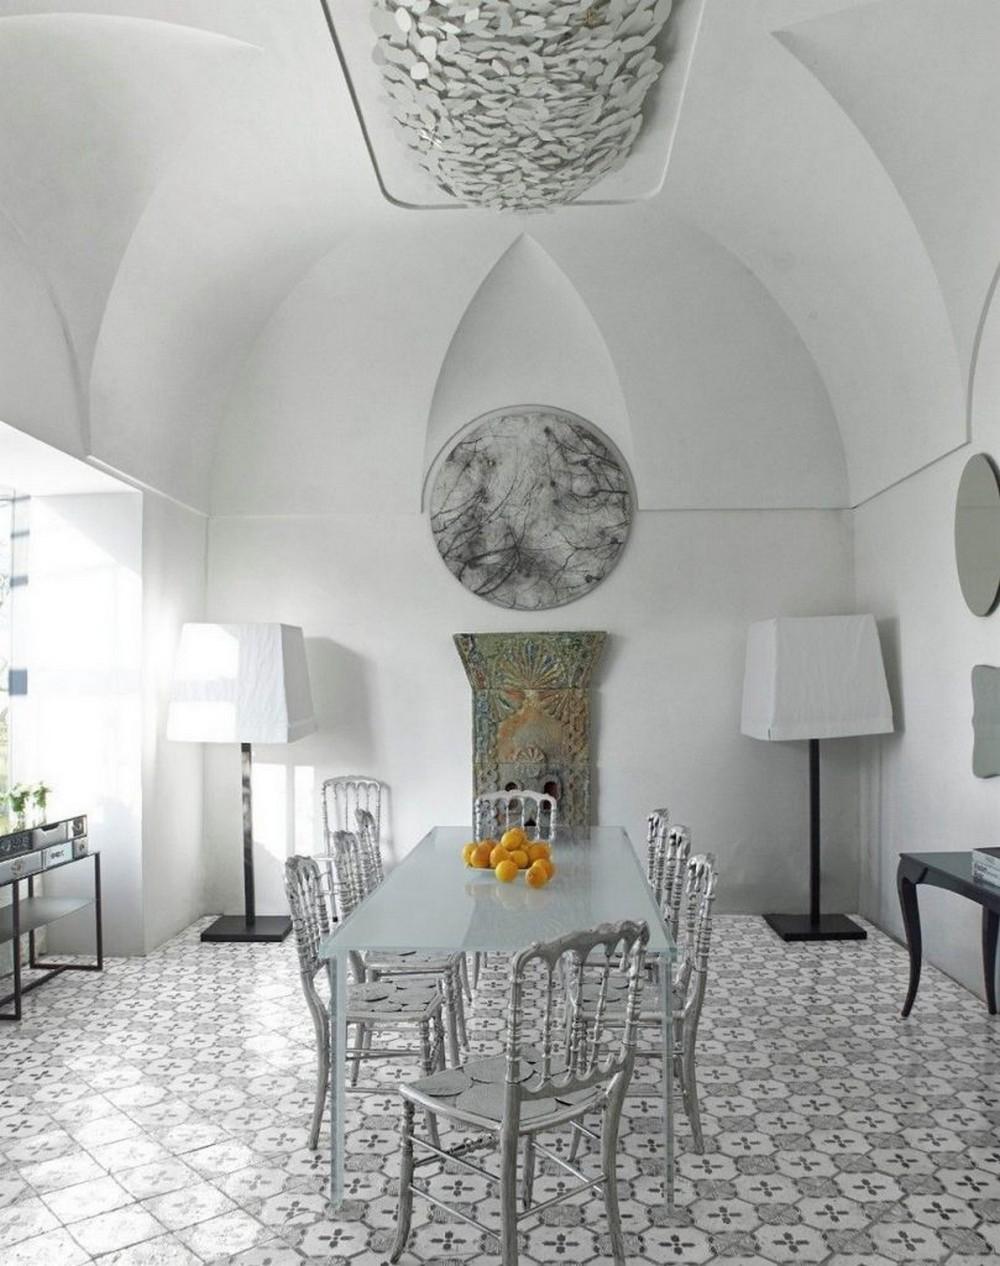 Design An Art Déco Design Project With The Help Of Jorge Cañete